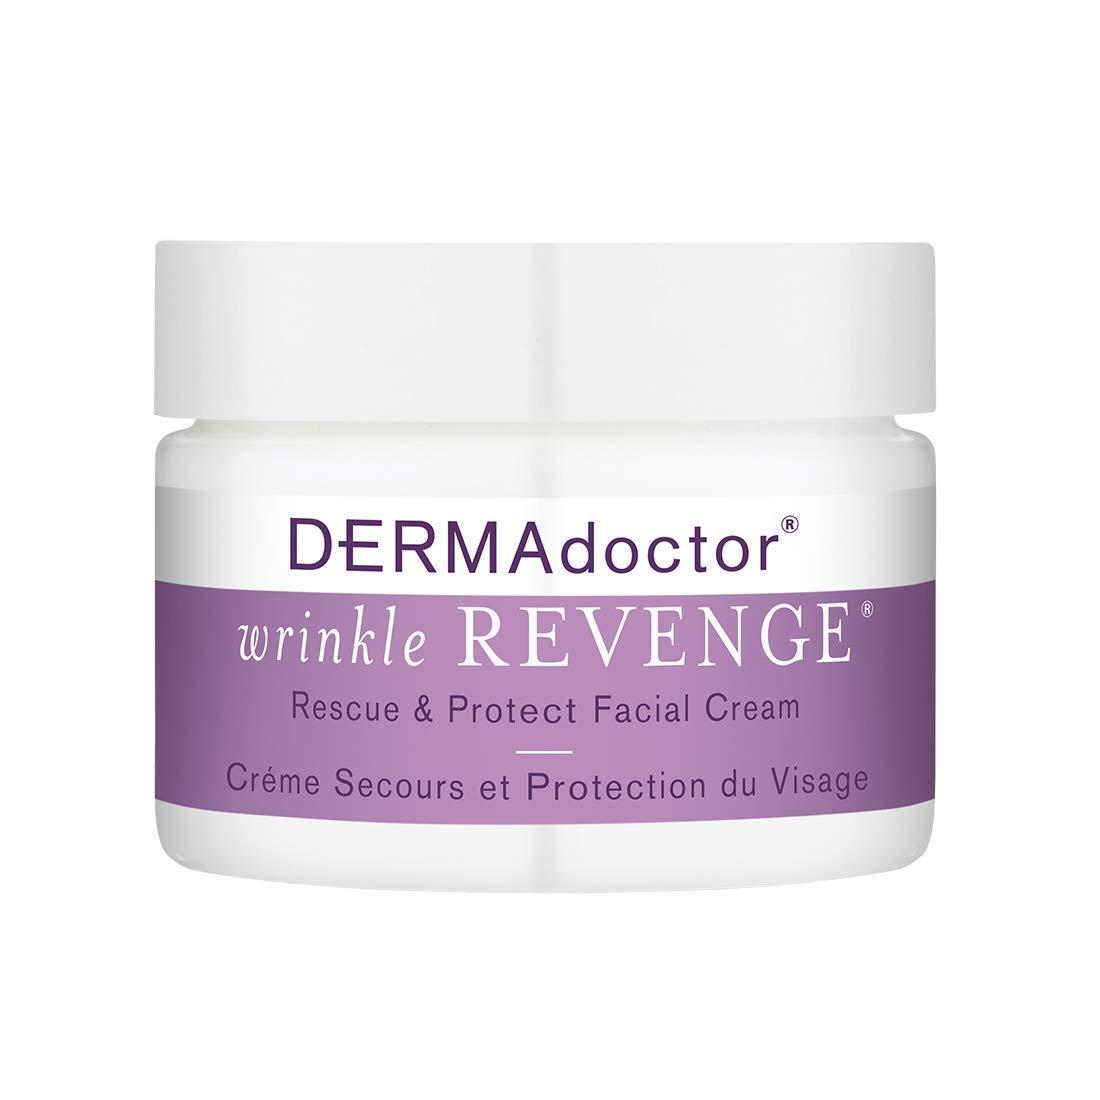 DERMAdoctor Wrinkle Revenge Rescue & Protect Facial Cream, 1.7 fl oz